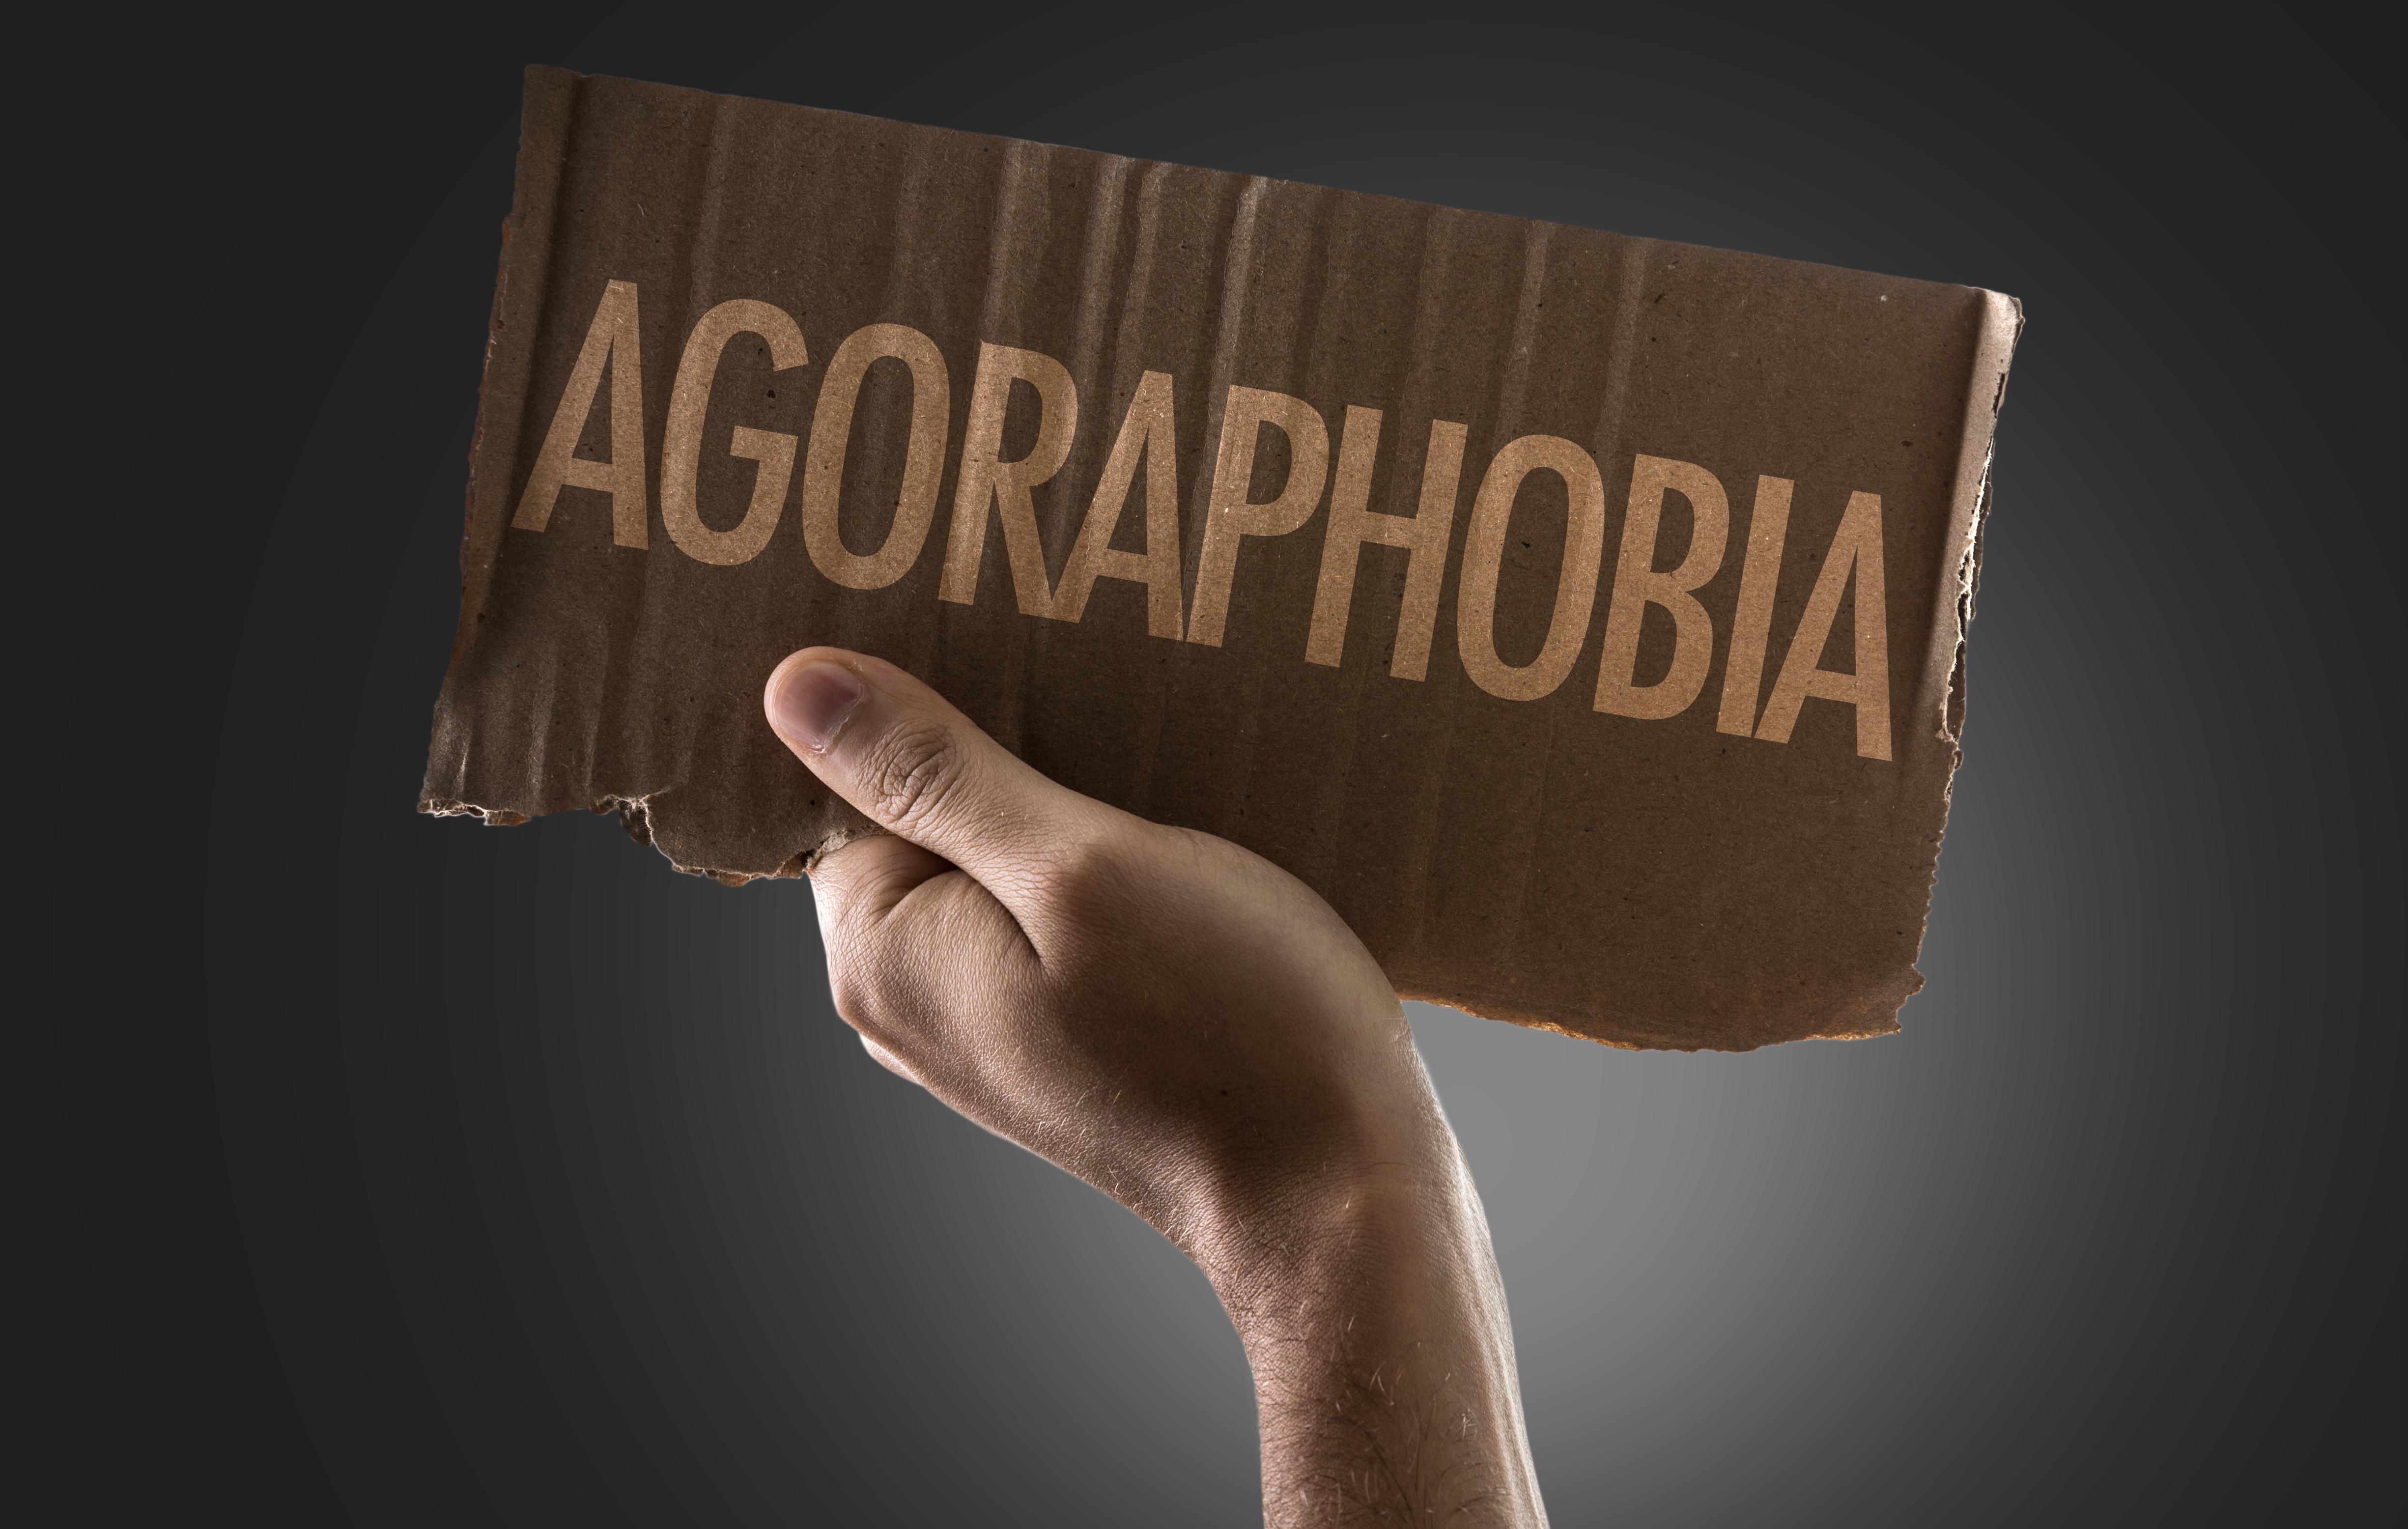 Agoraphobia and Marijuana Information: Treat Agoraphobia With Cannabis